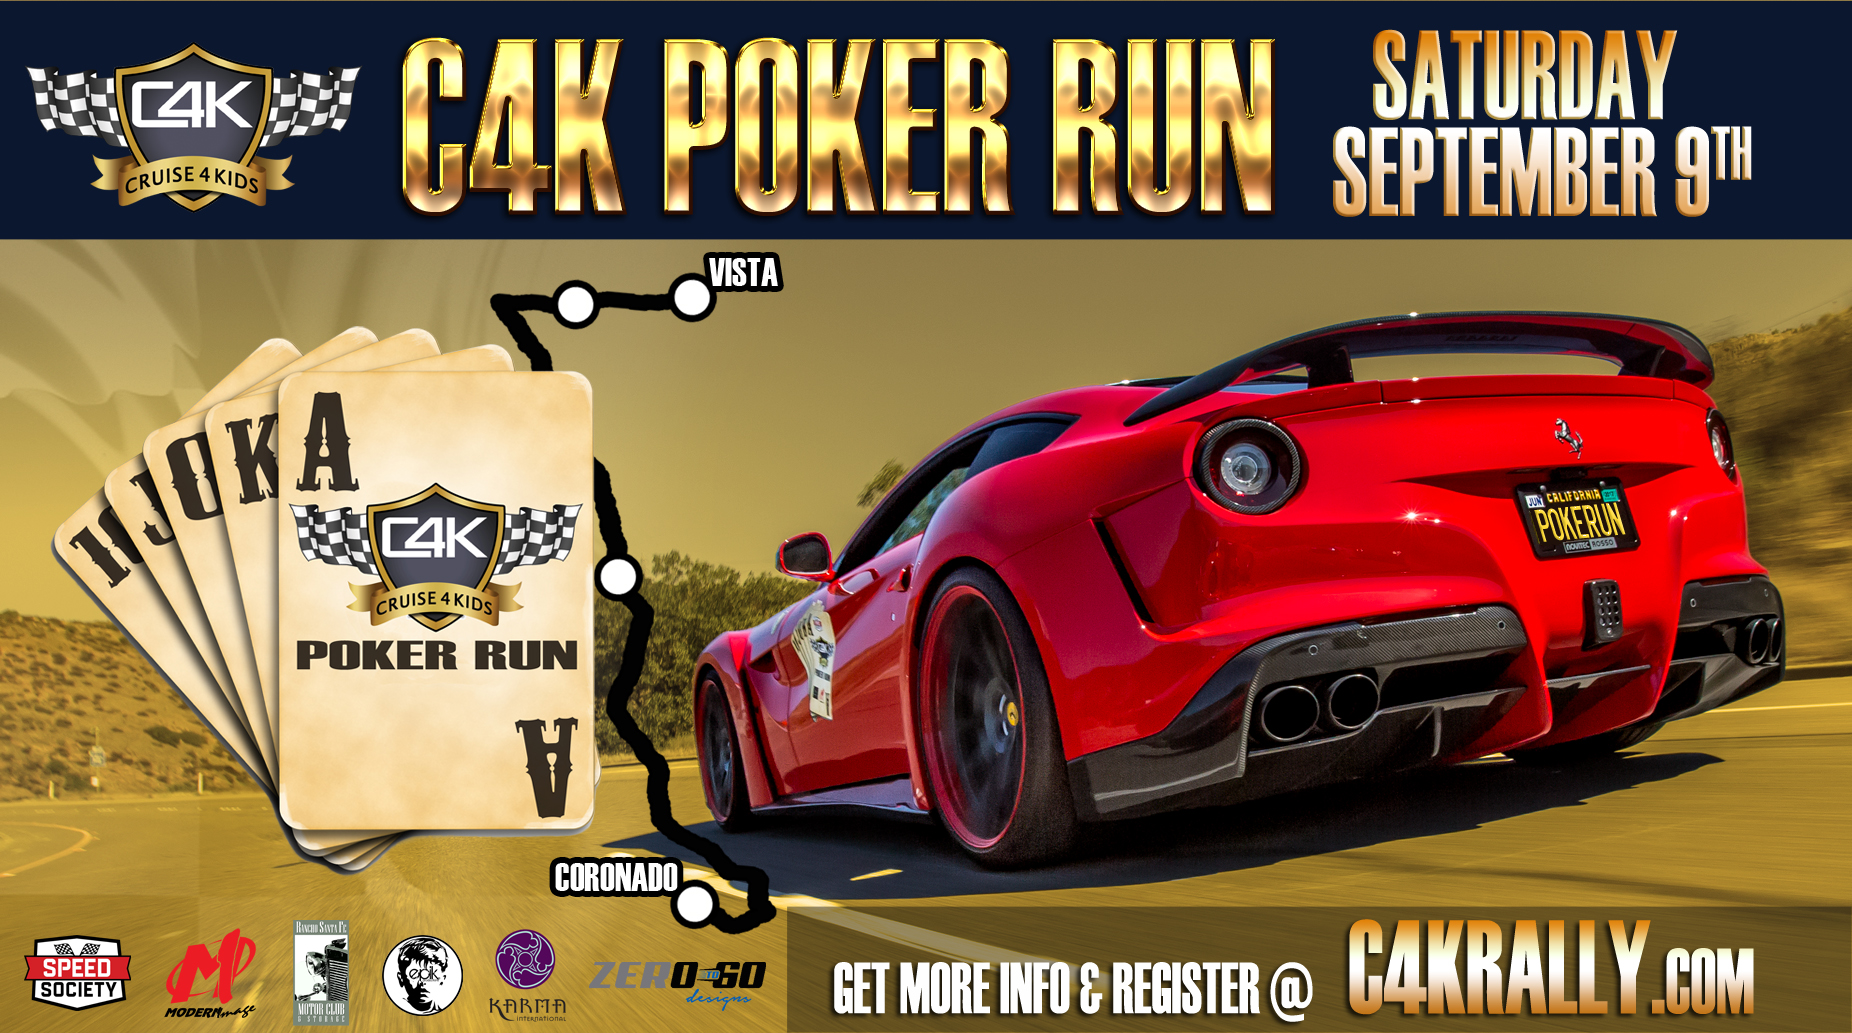 C4K Rally promo